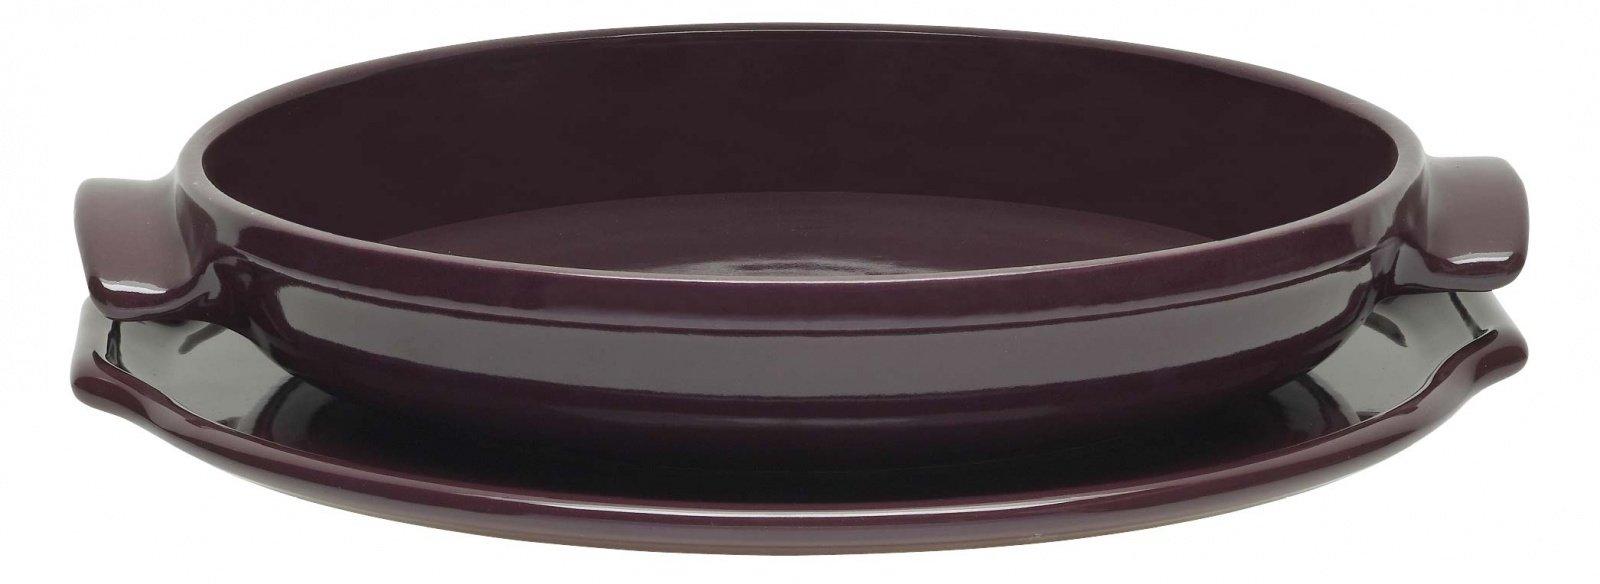 Набор для выпечки пирога Татен  30 см (цвет: инжир) Emile Henry